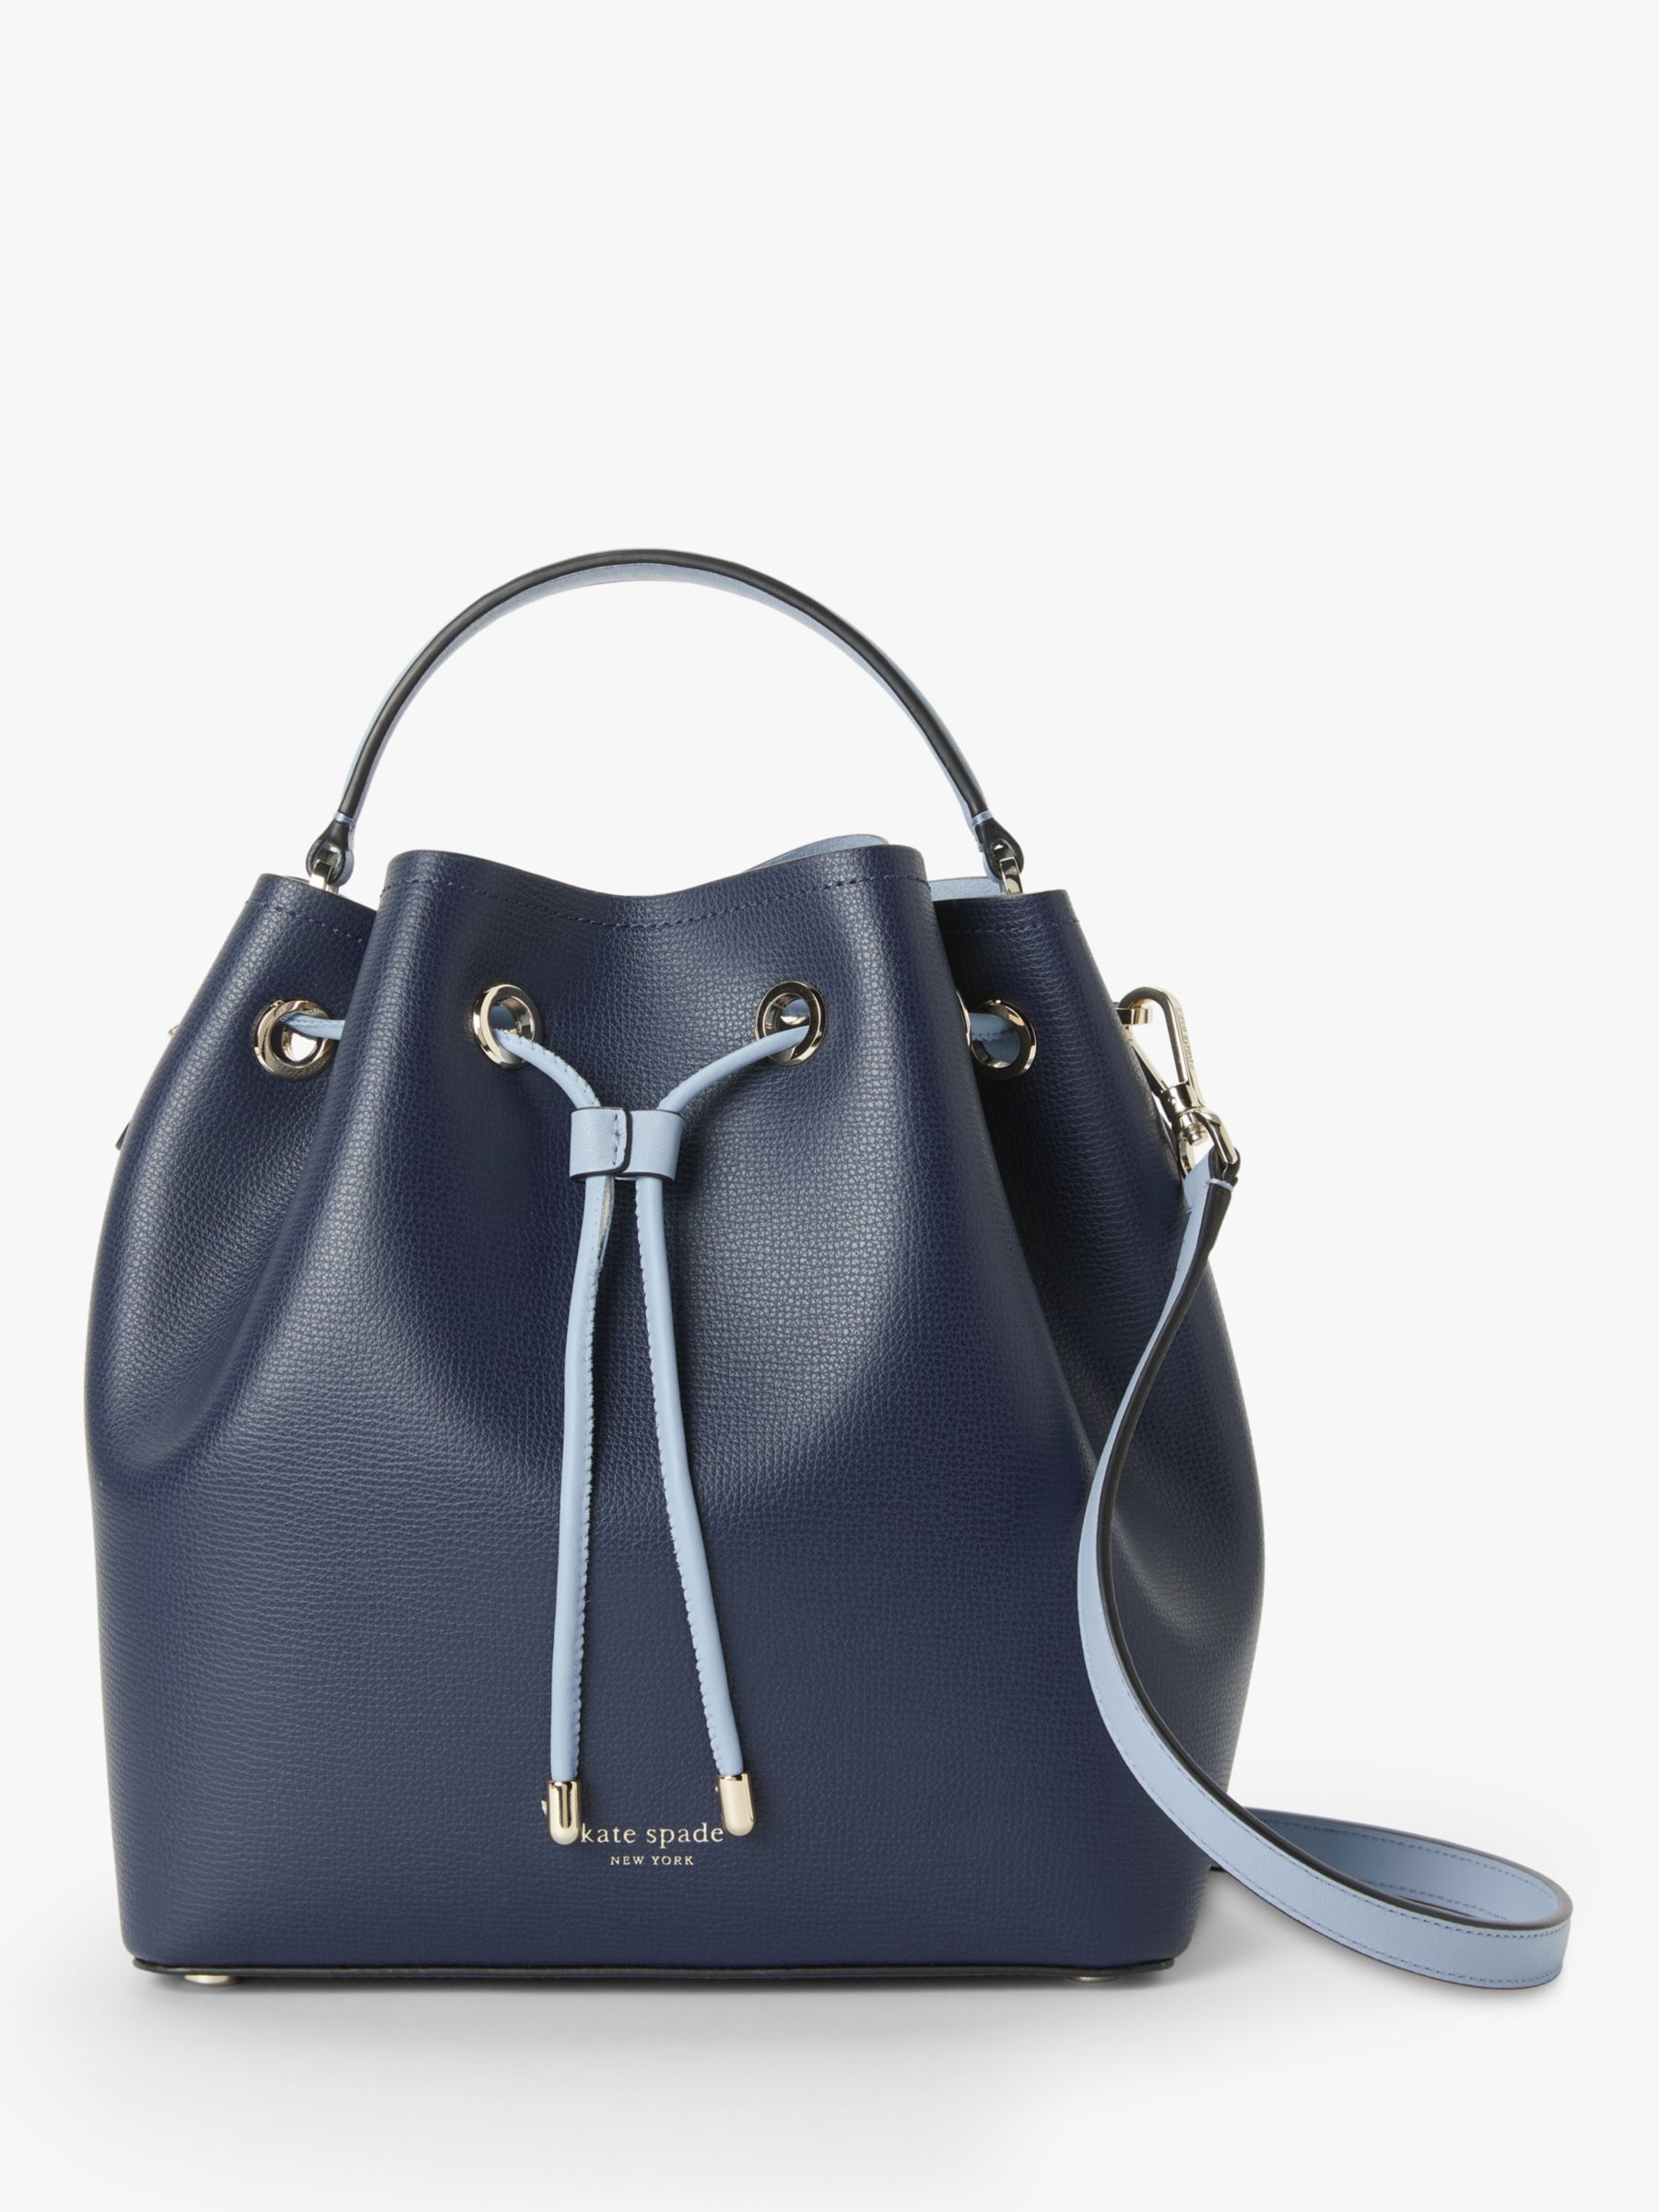 97245f95100a kate spade new york Vivian Leather Medium Bucket Bag at John Lewis &  Partners